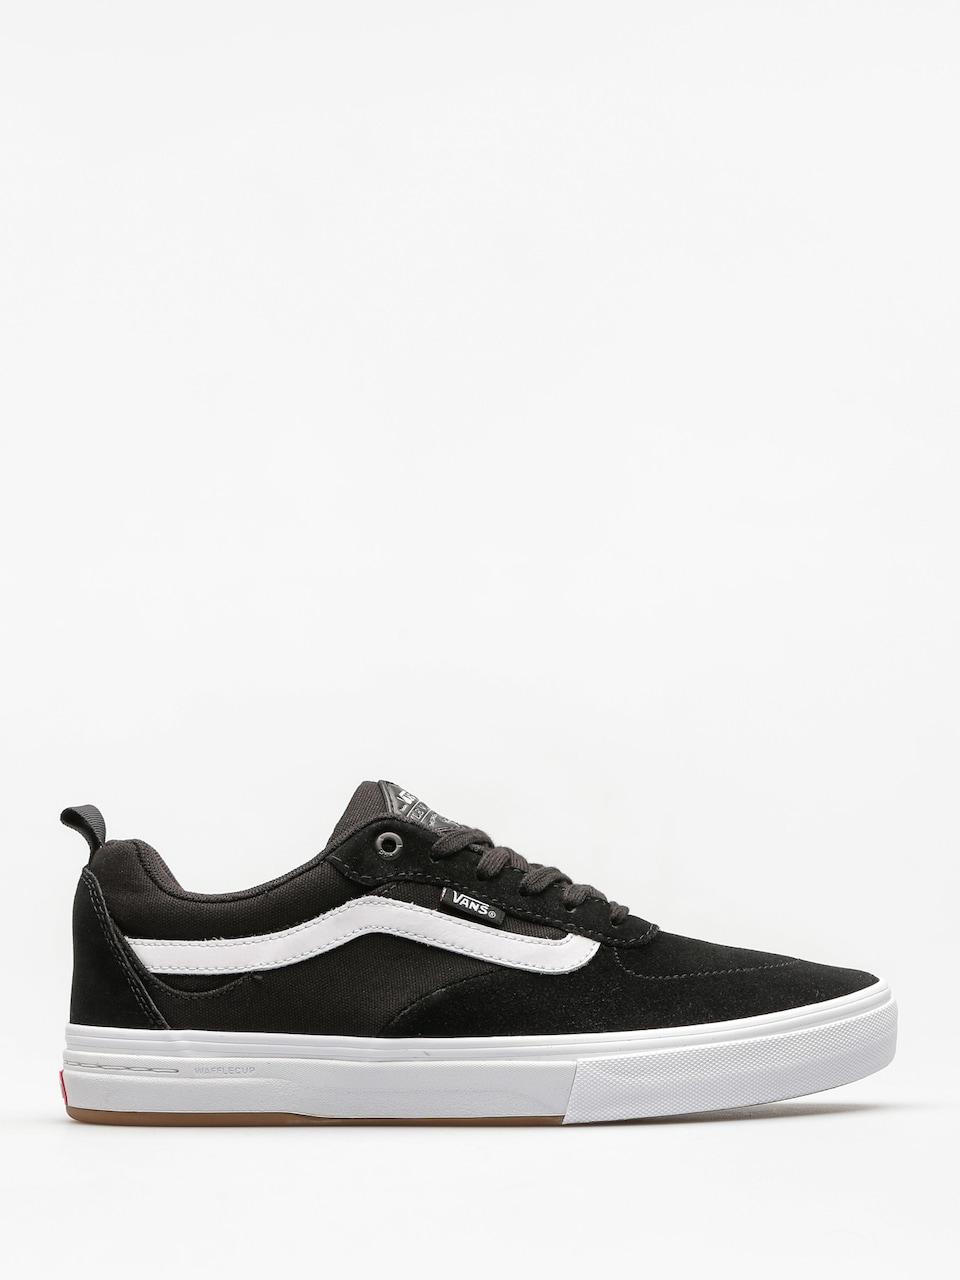 Vans Shoes Kyle Walker Pro (black/white)